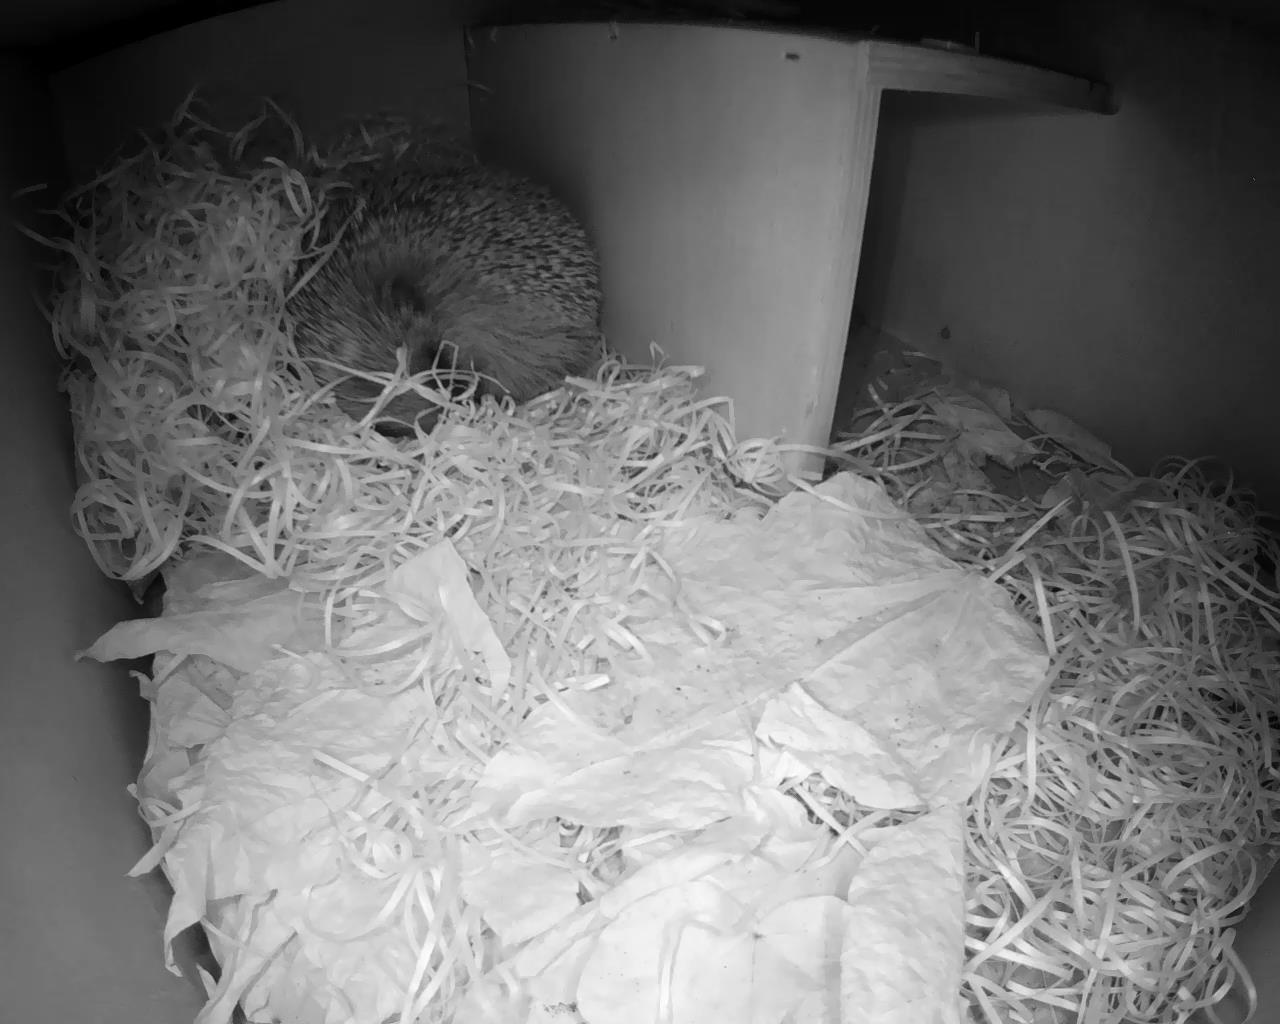 Hedgehog Box 2016-04-17 21-19-44.028